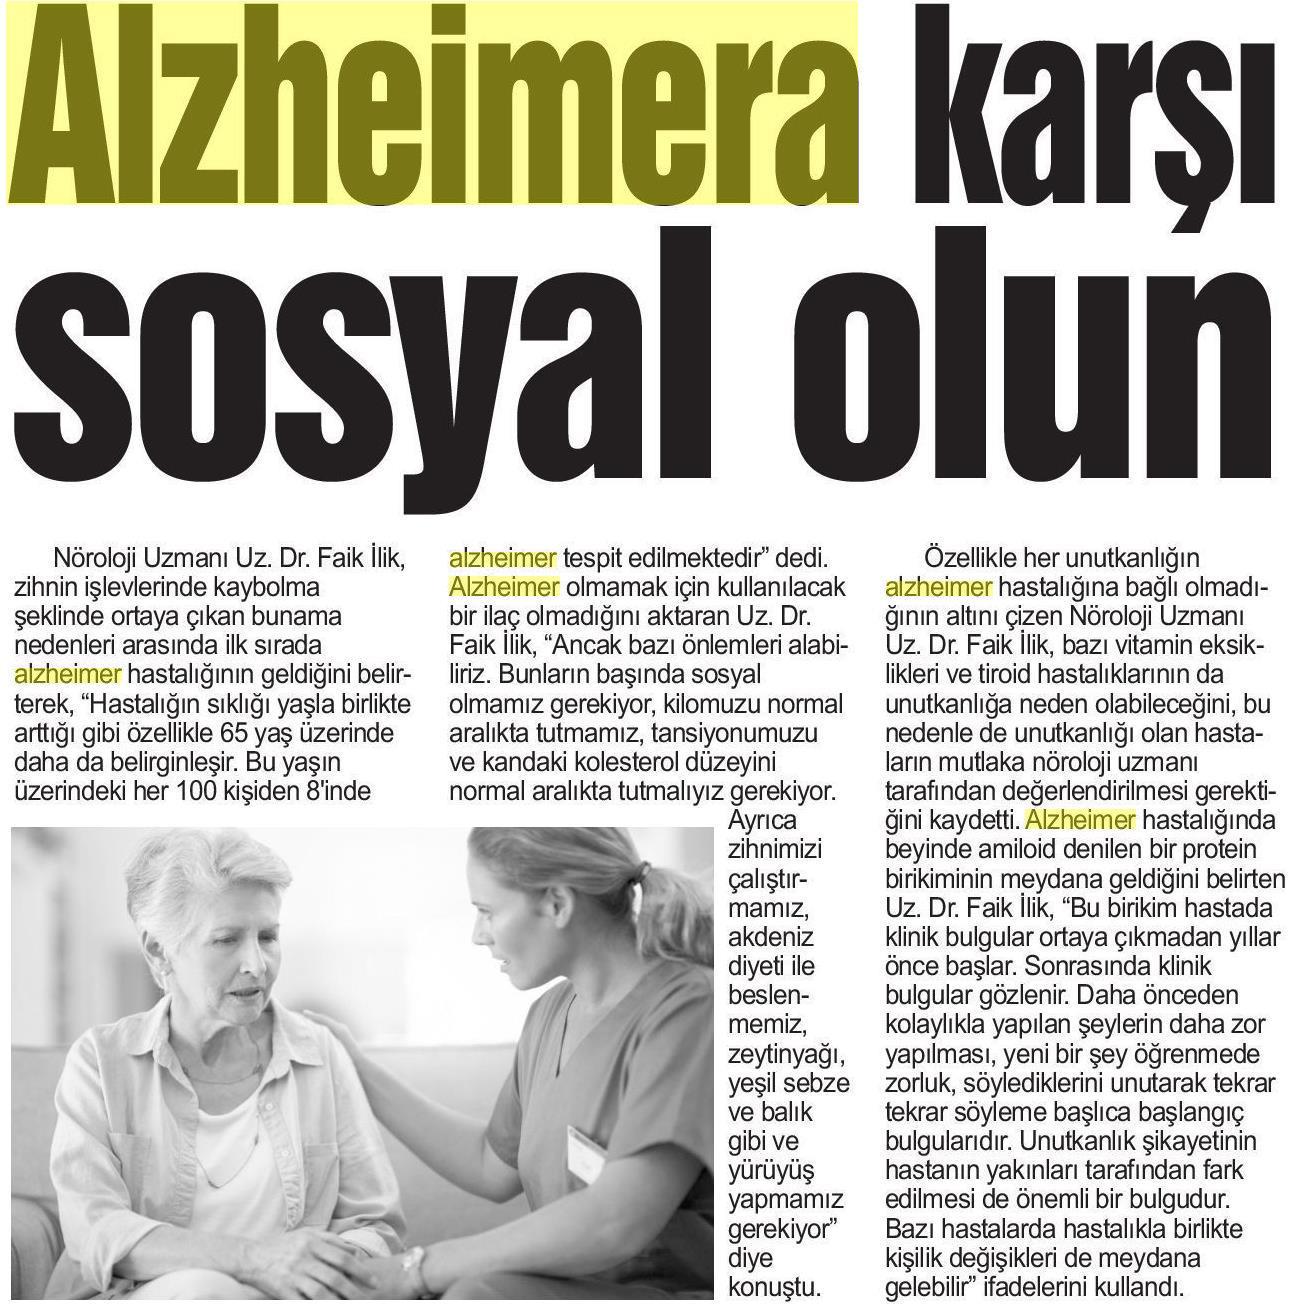 Alzheimer'a Karşı Sosyal Olun